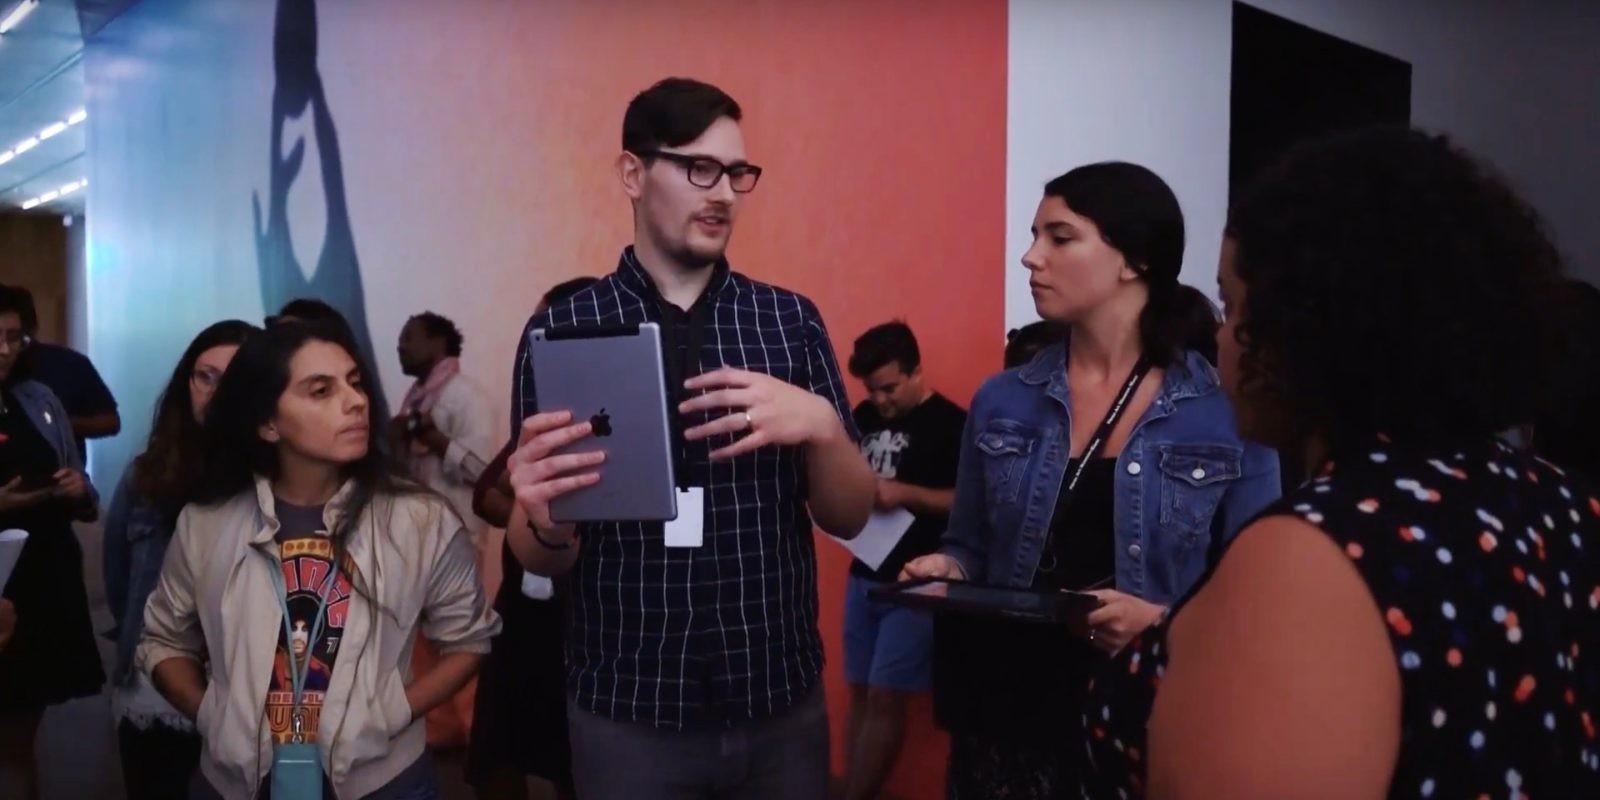 Pérez Art Museum Miami featuring first ARKit-powered digital art exhibit